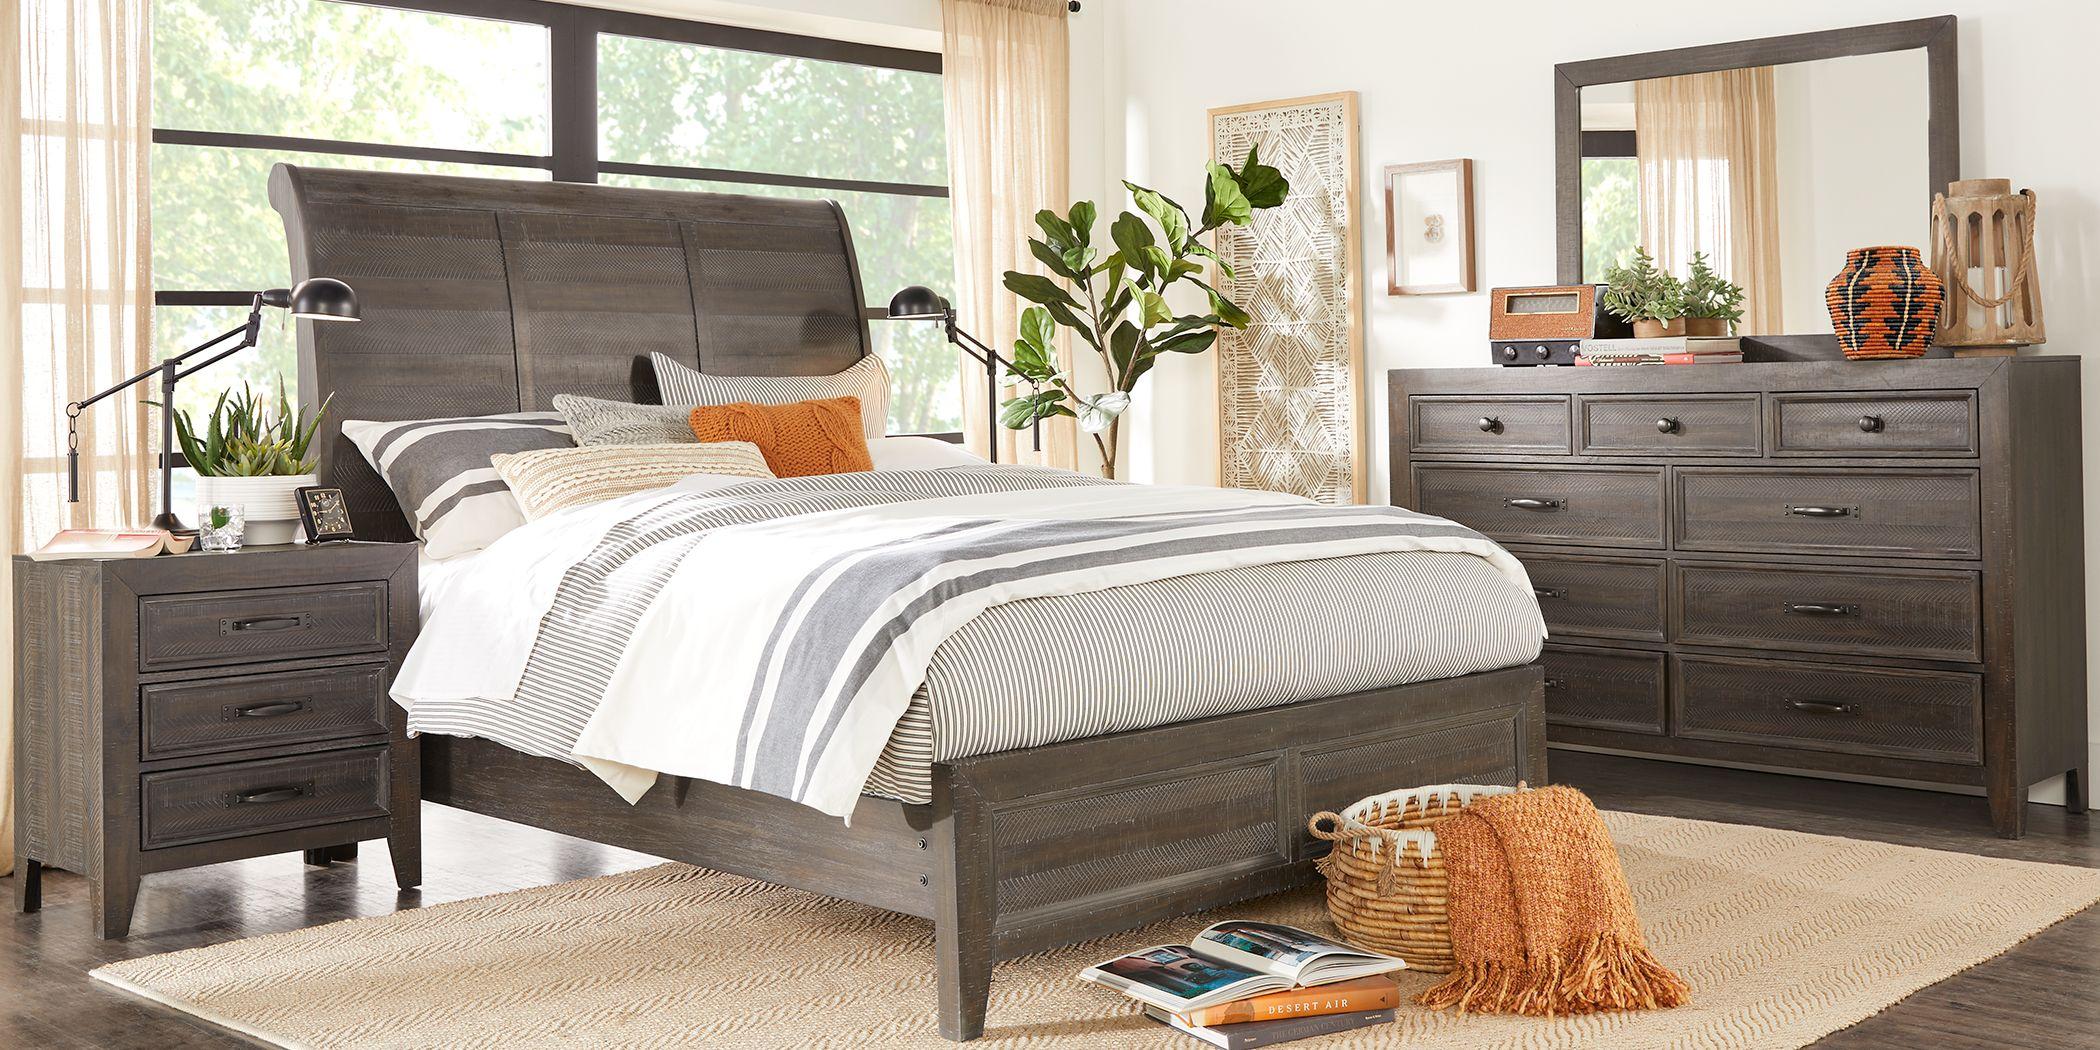 Finlay Espresso 5 Pc King Sleigh Bedroom